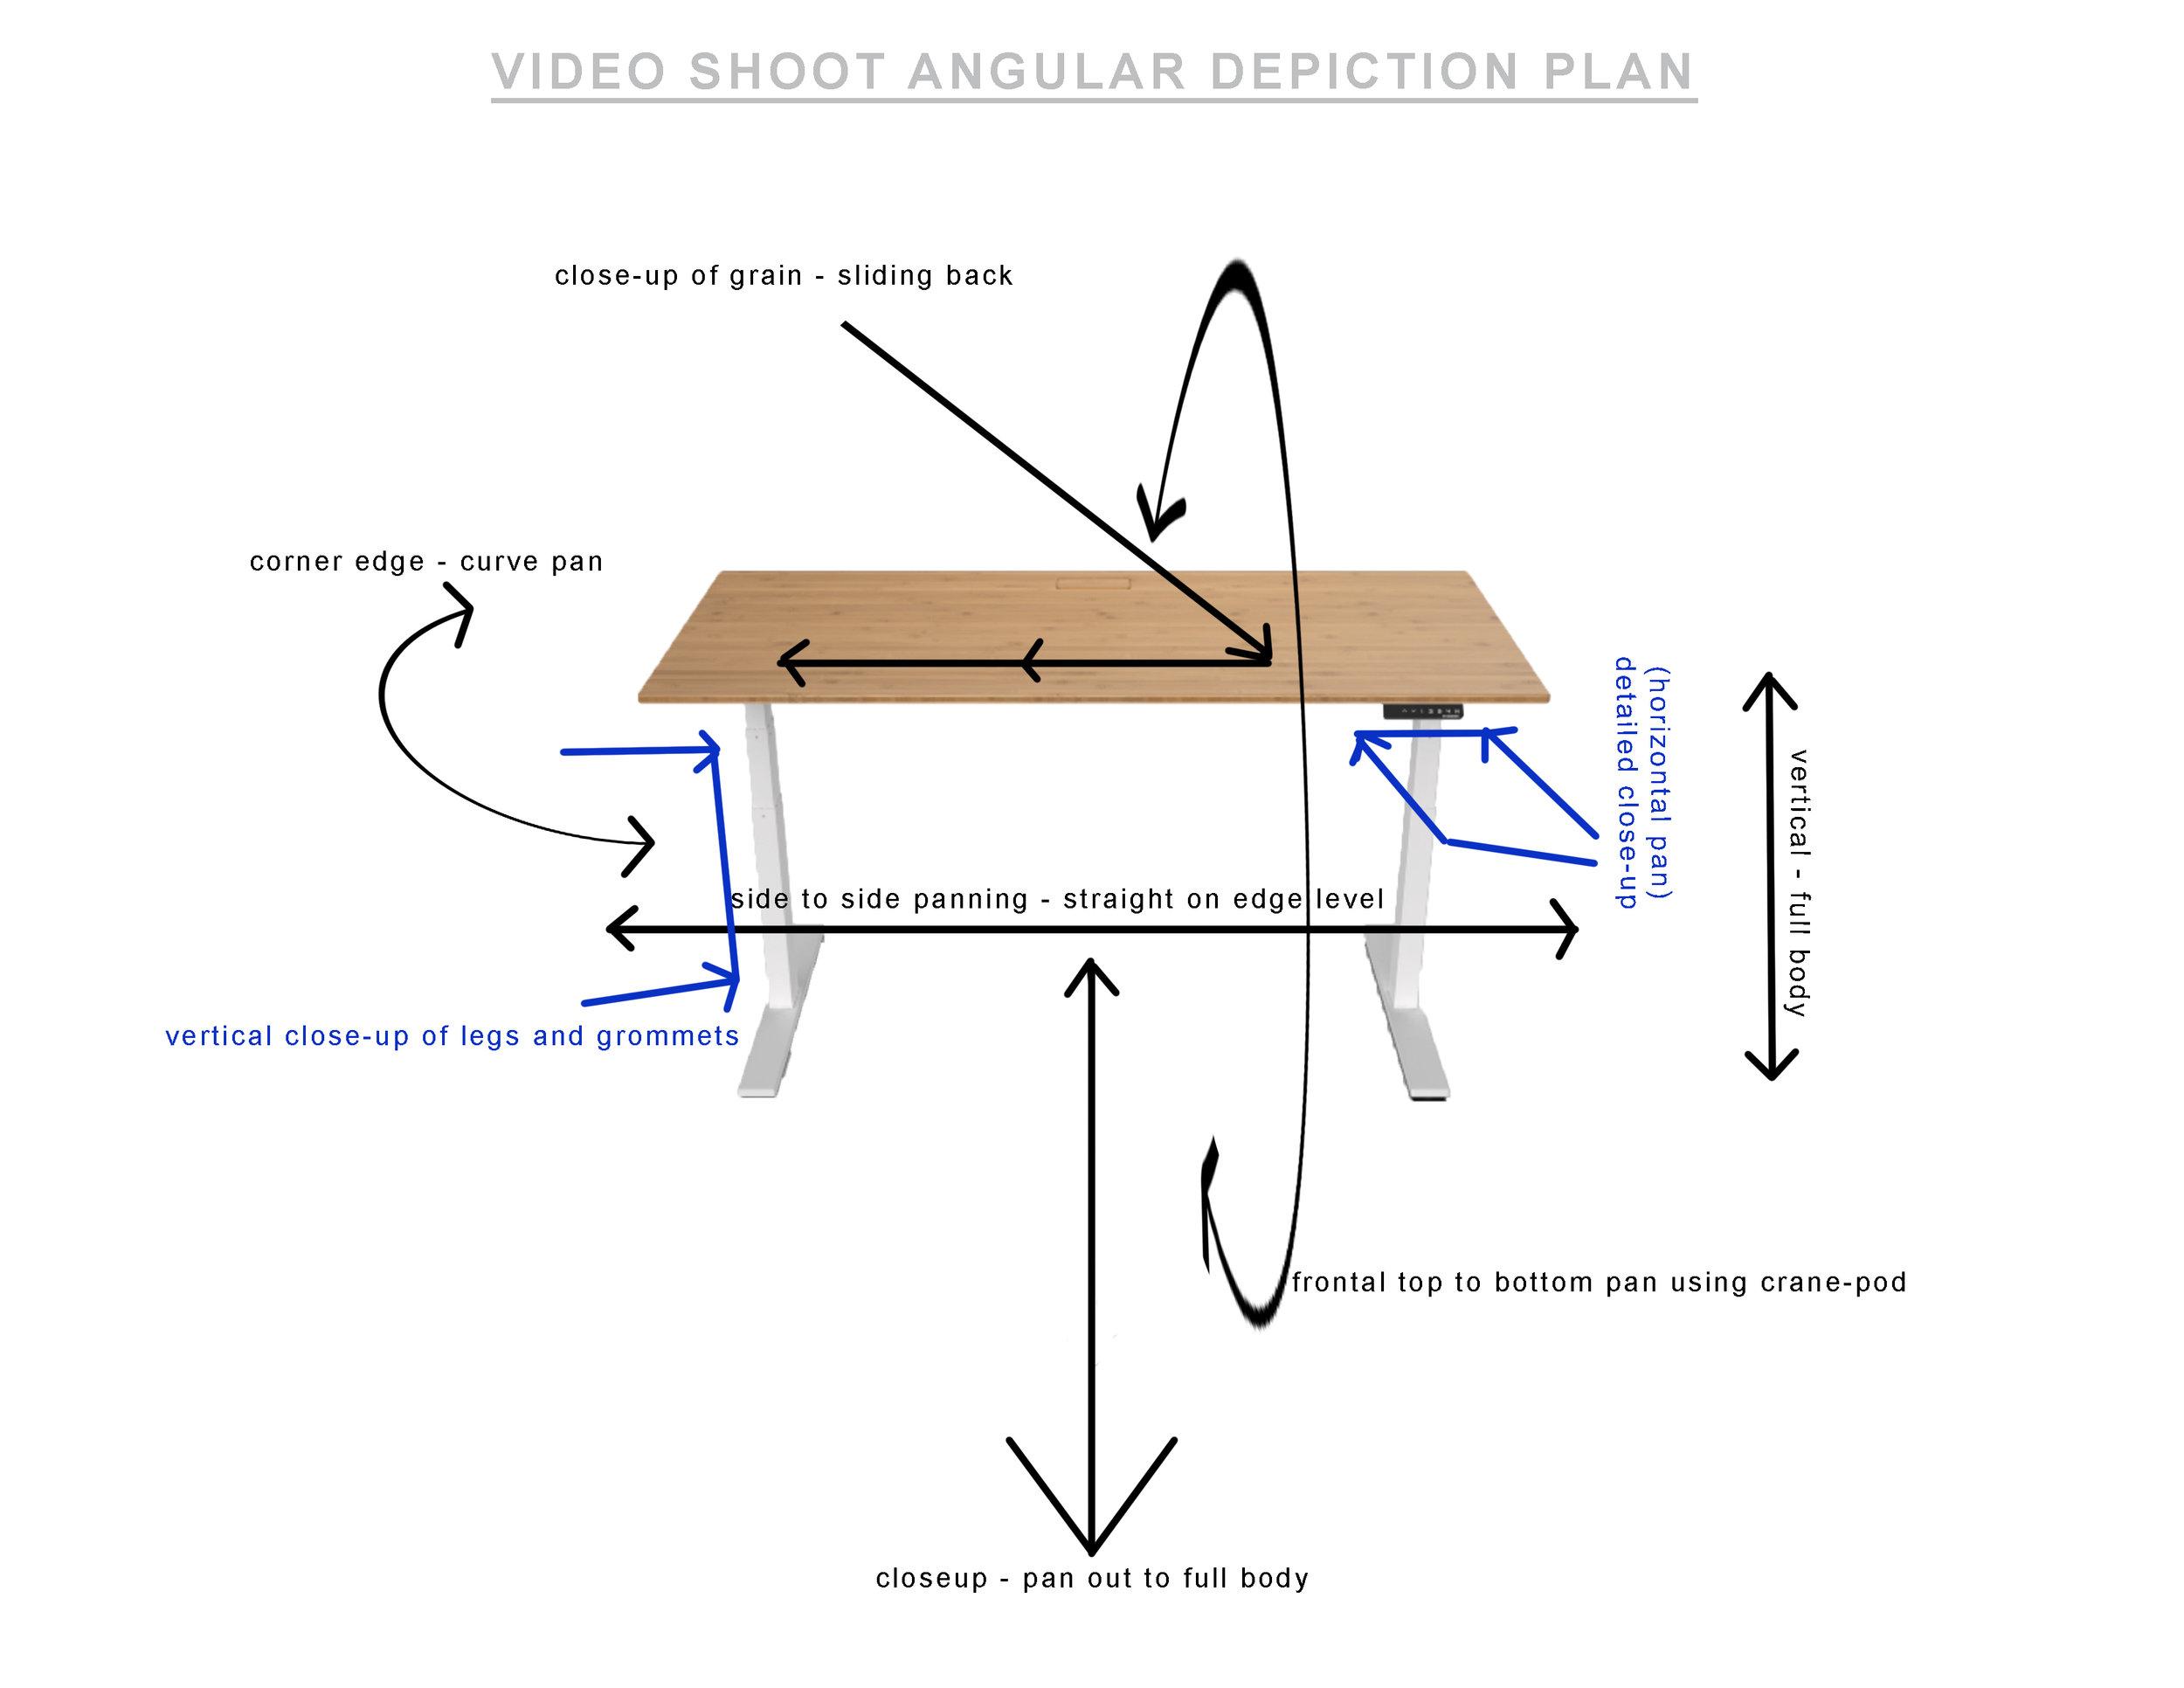 desk shoot - Angular Depiction Plan.jpg